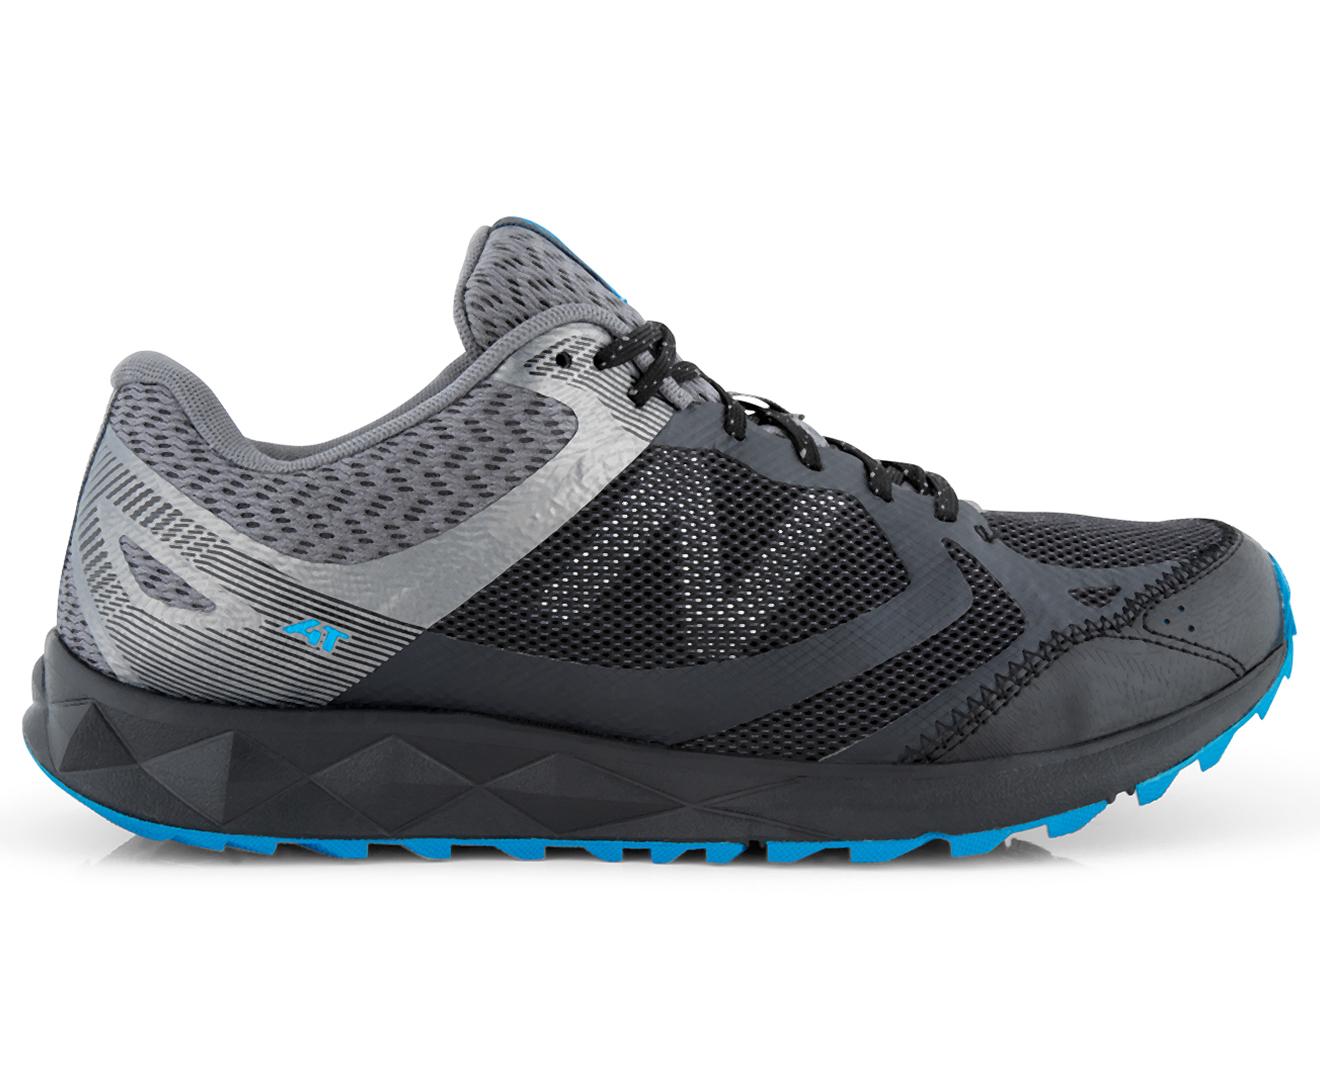 New Balance Men's 590 V3 2E Wide Fit Trail Shoe Black/Castlerock/Bolt